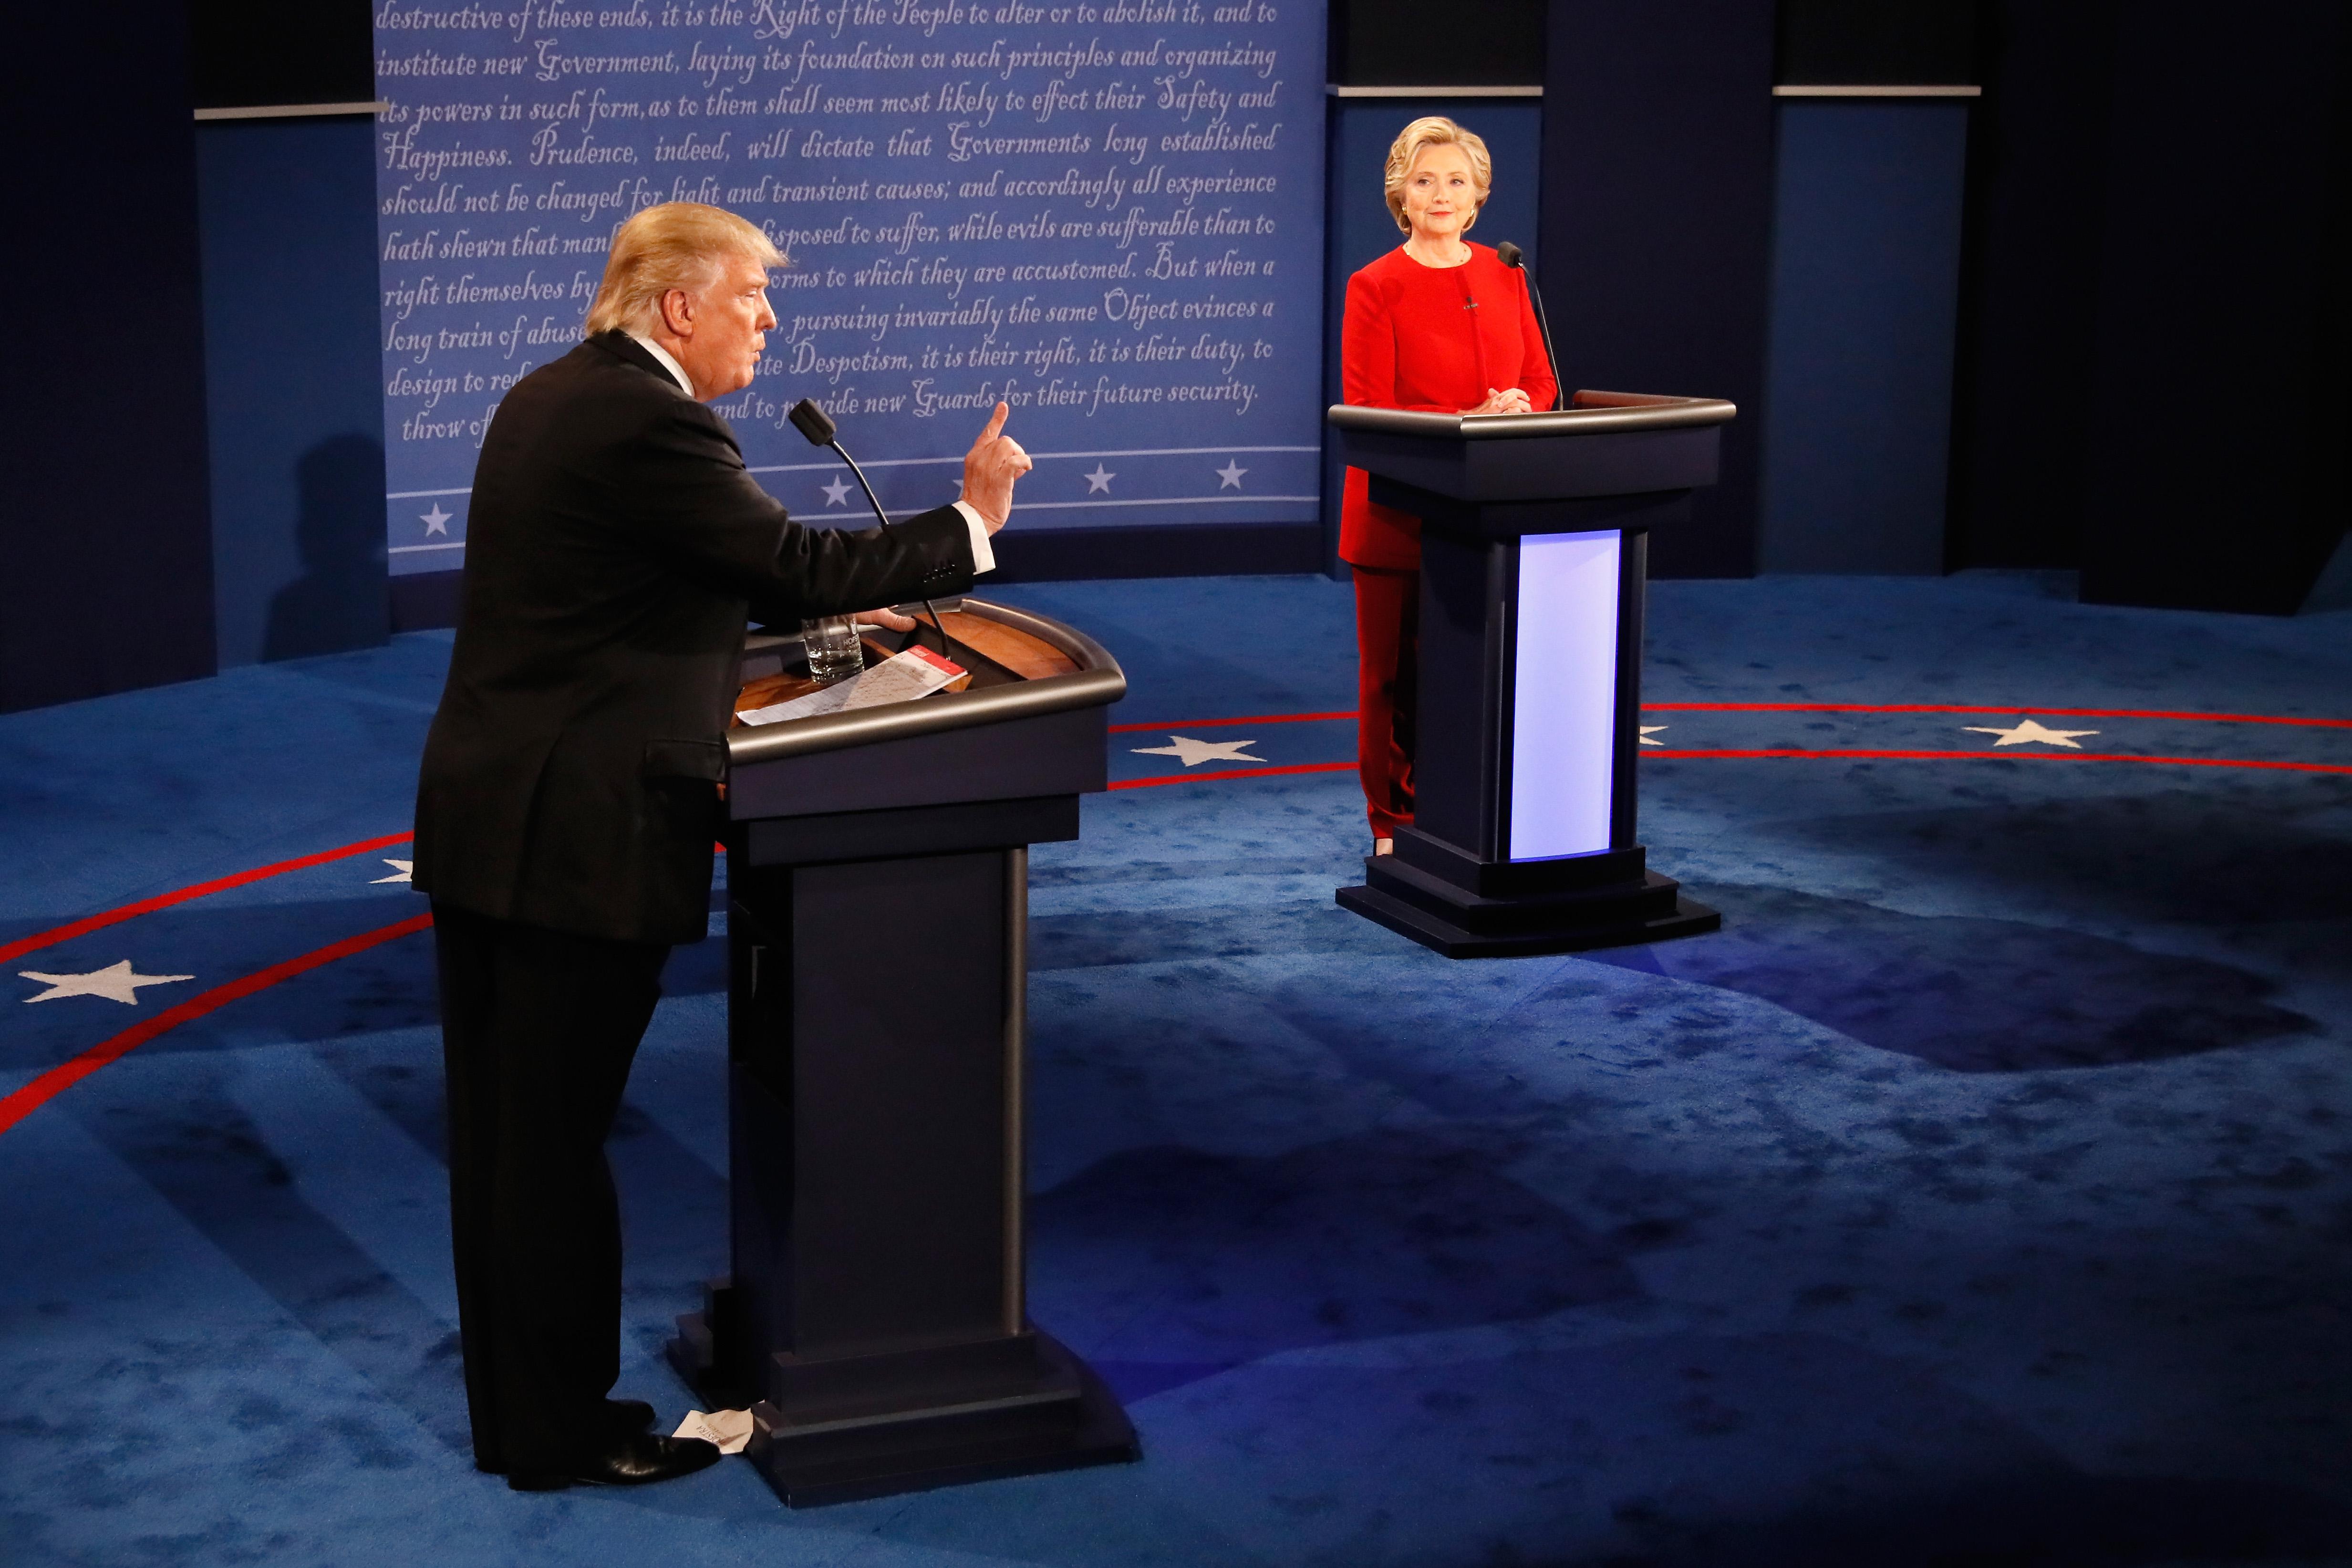 Republican presidential nominee Donald Trump (L) speaks as Democratic presidential nominee Hillary Clinton (R) listens during the Presidential Debate at Hofstra University on September 26, 2016 in Hempstead, New York